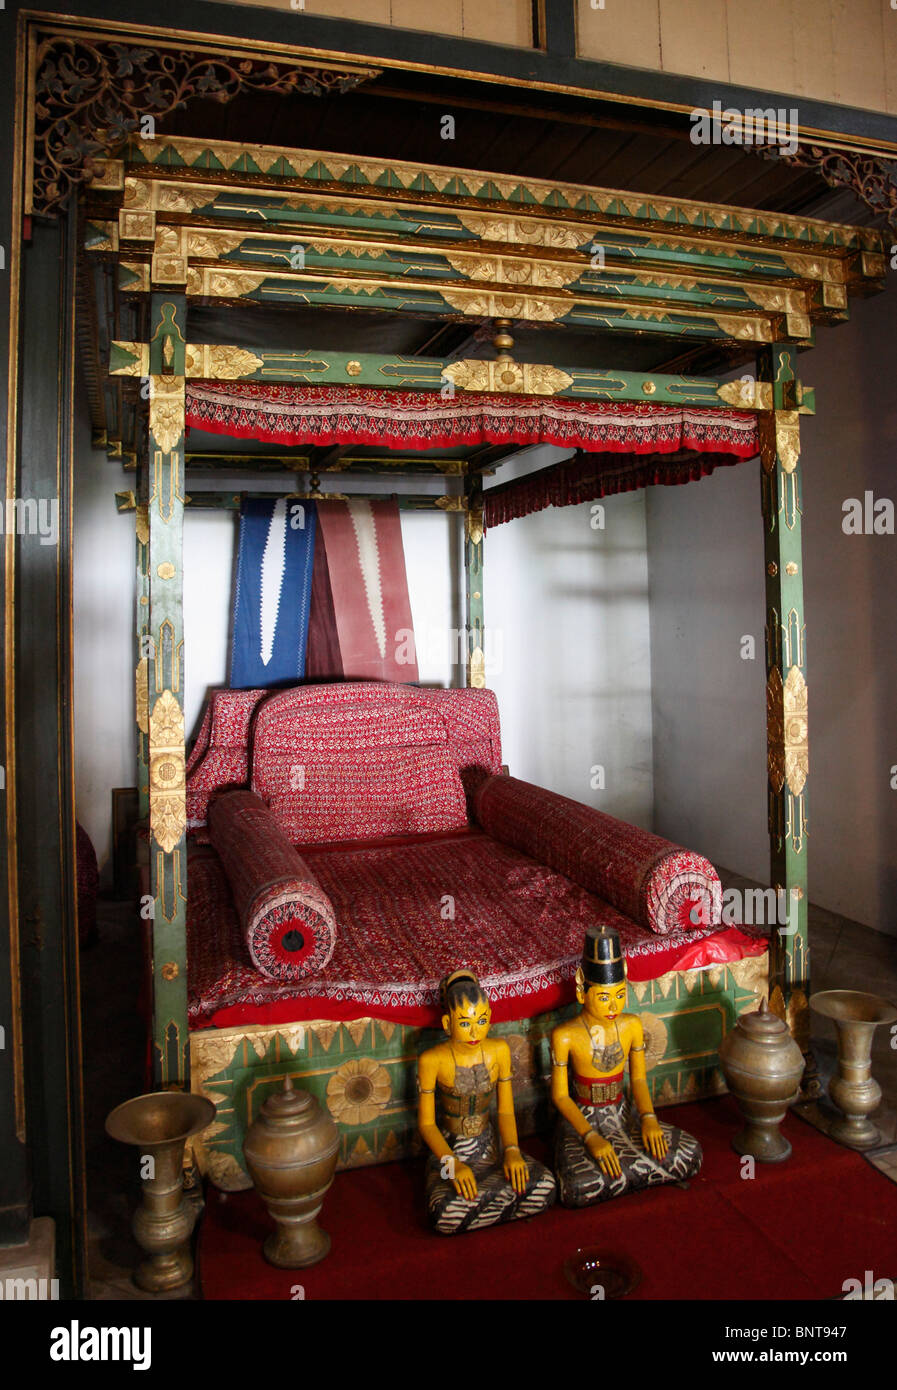 Indonesia; Java; Yogyakarta; traditional javanese home interior, bedroom, - Stock Image